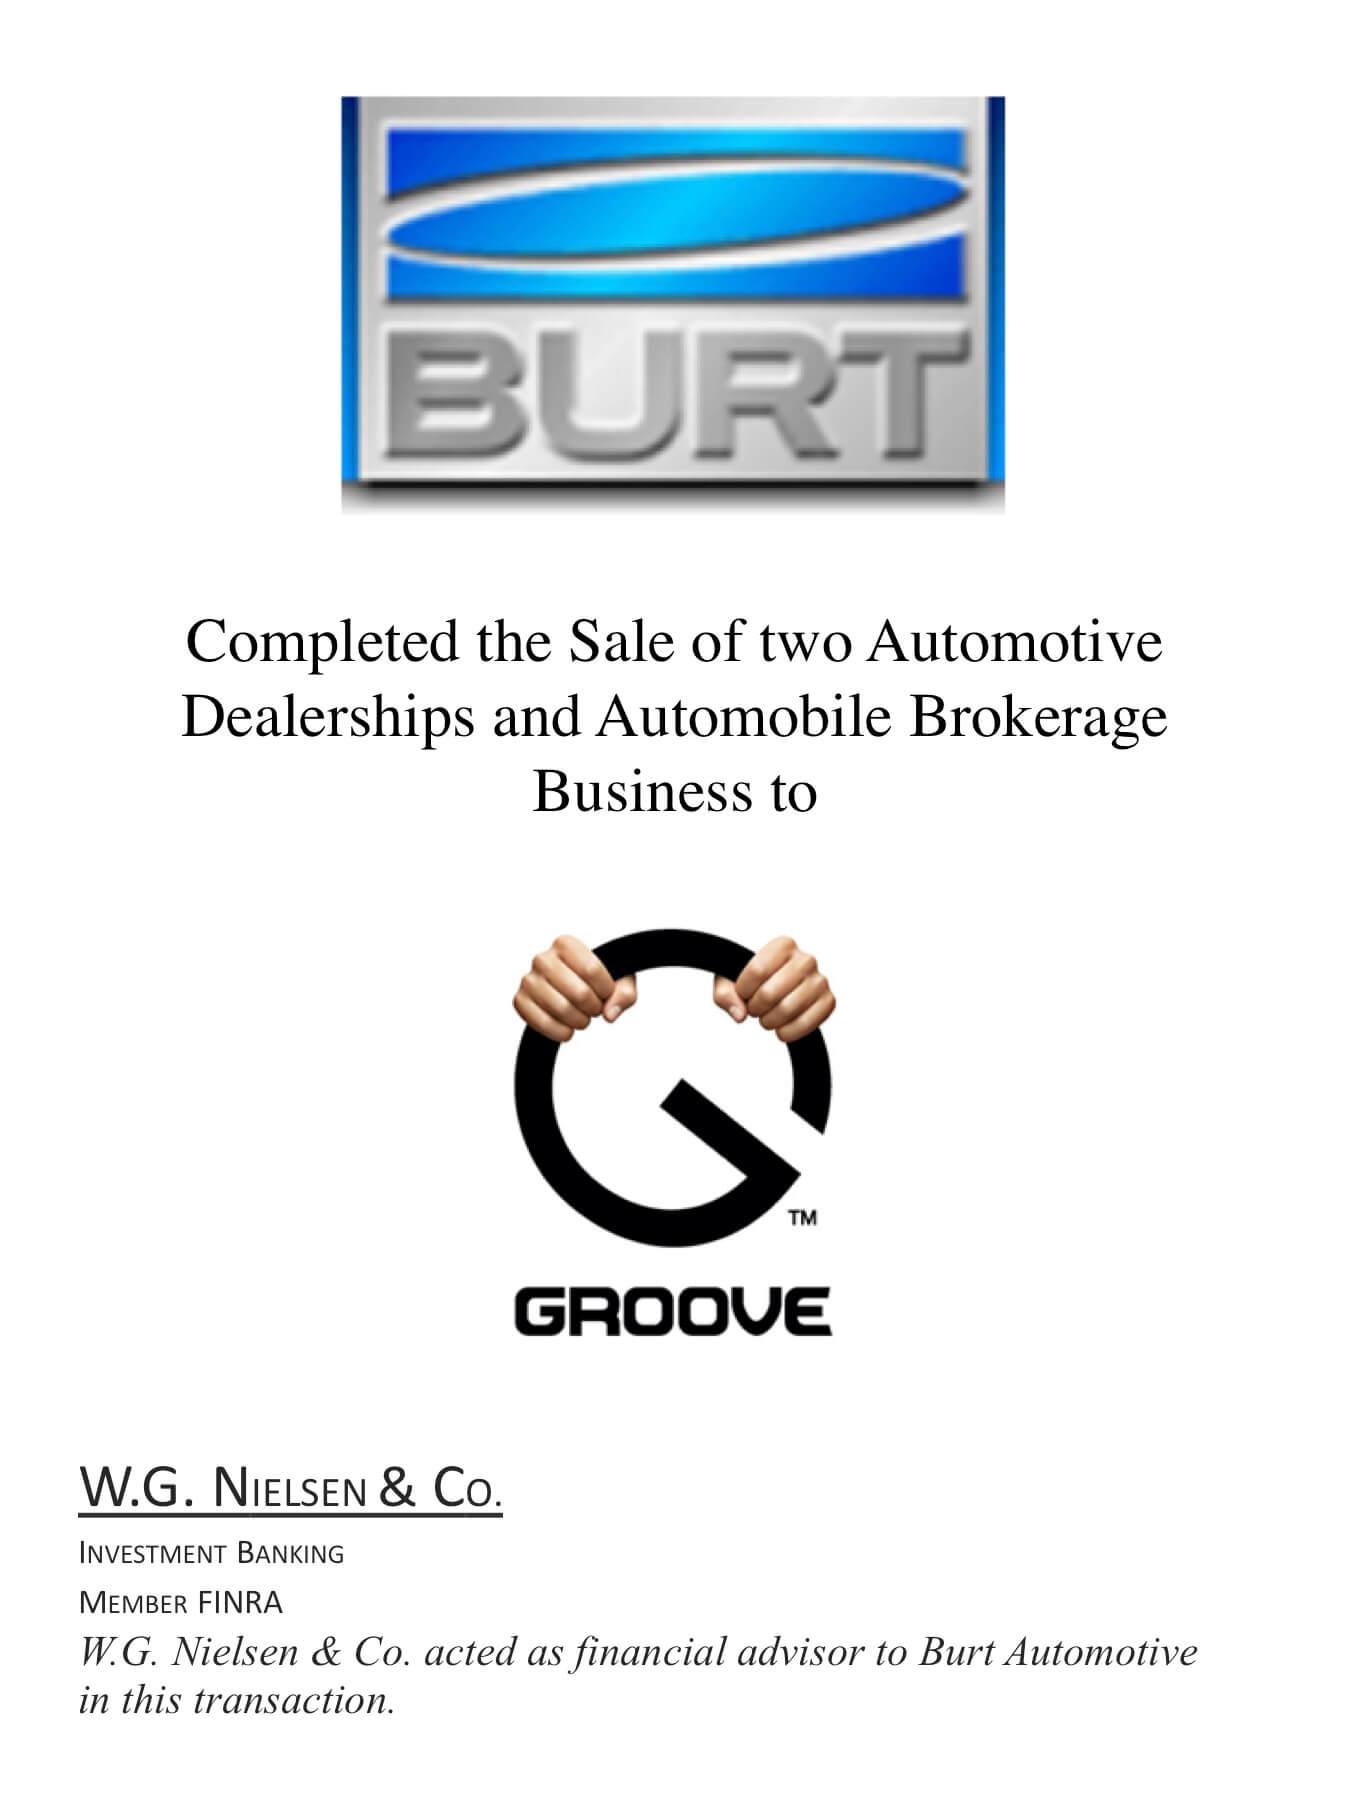 burt investment banking transaction